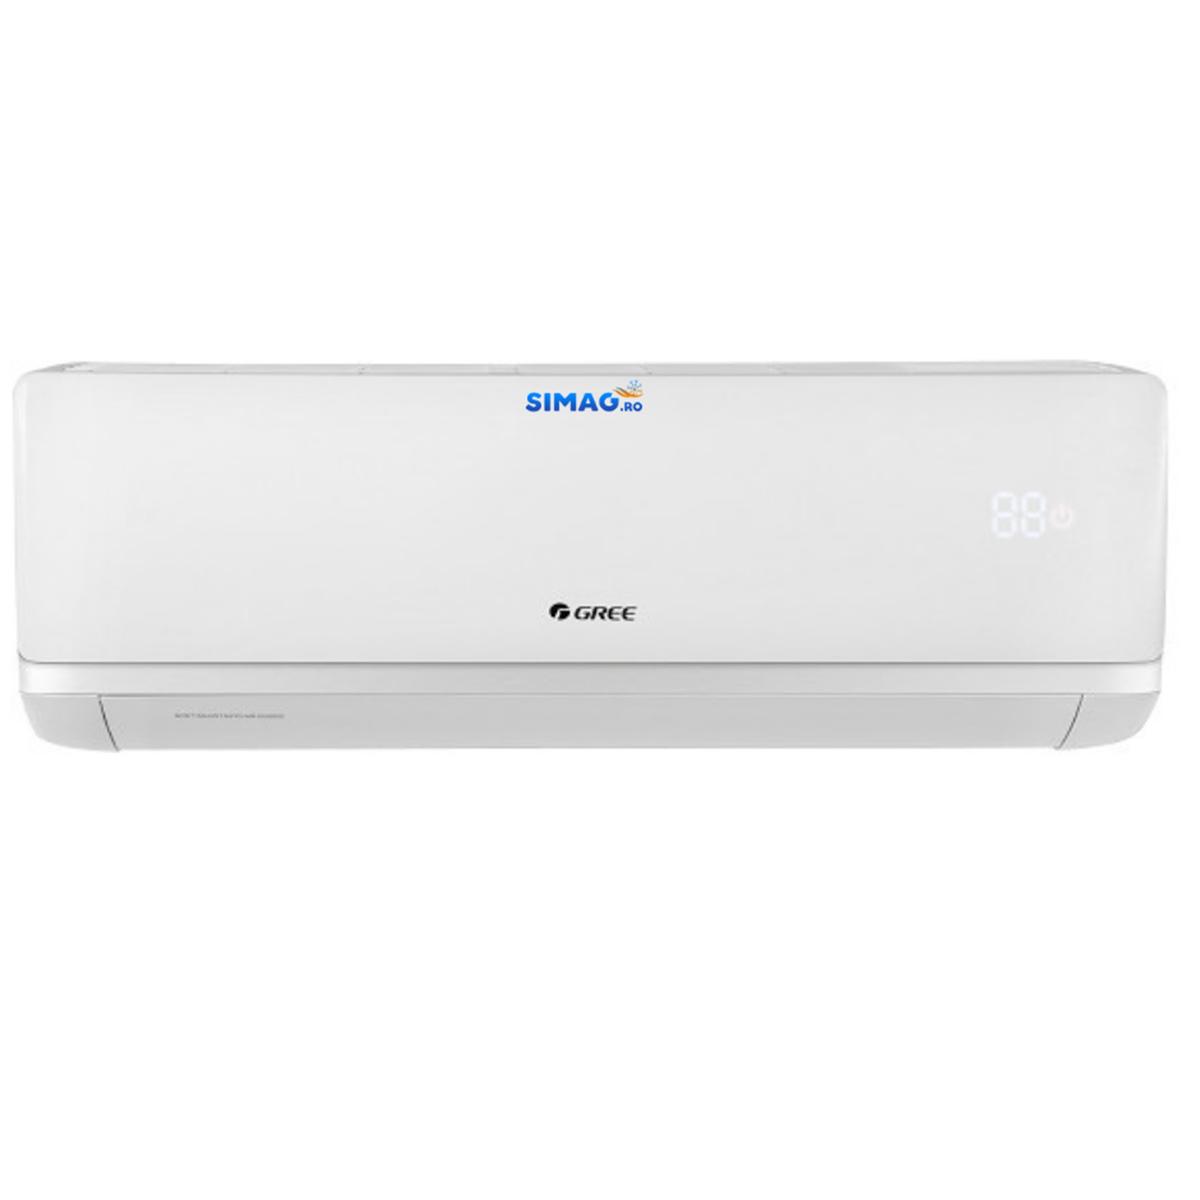 Aparat de aer conditionat tip split Gree Bora A2 WHITE, Inverter, clasa A++, R-32, WiFi 17